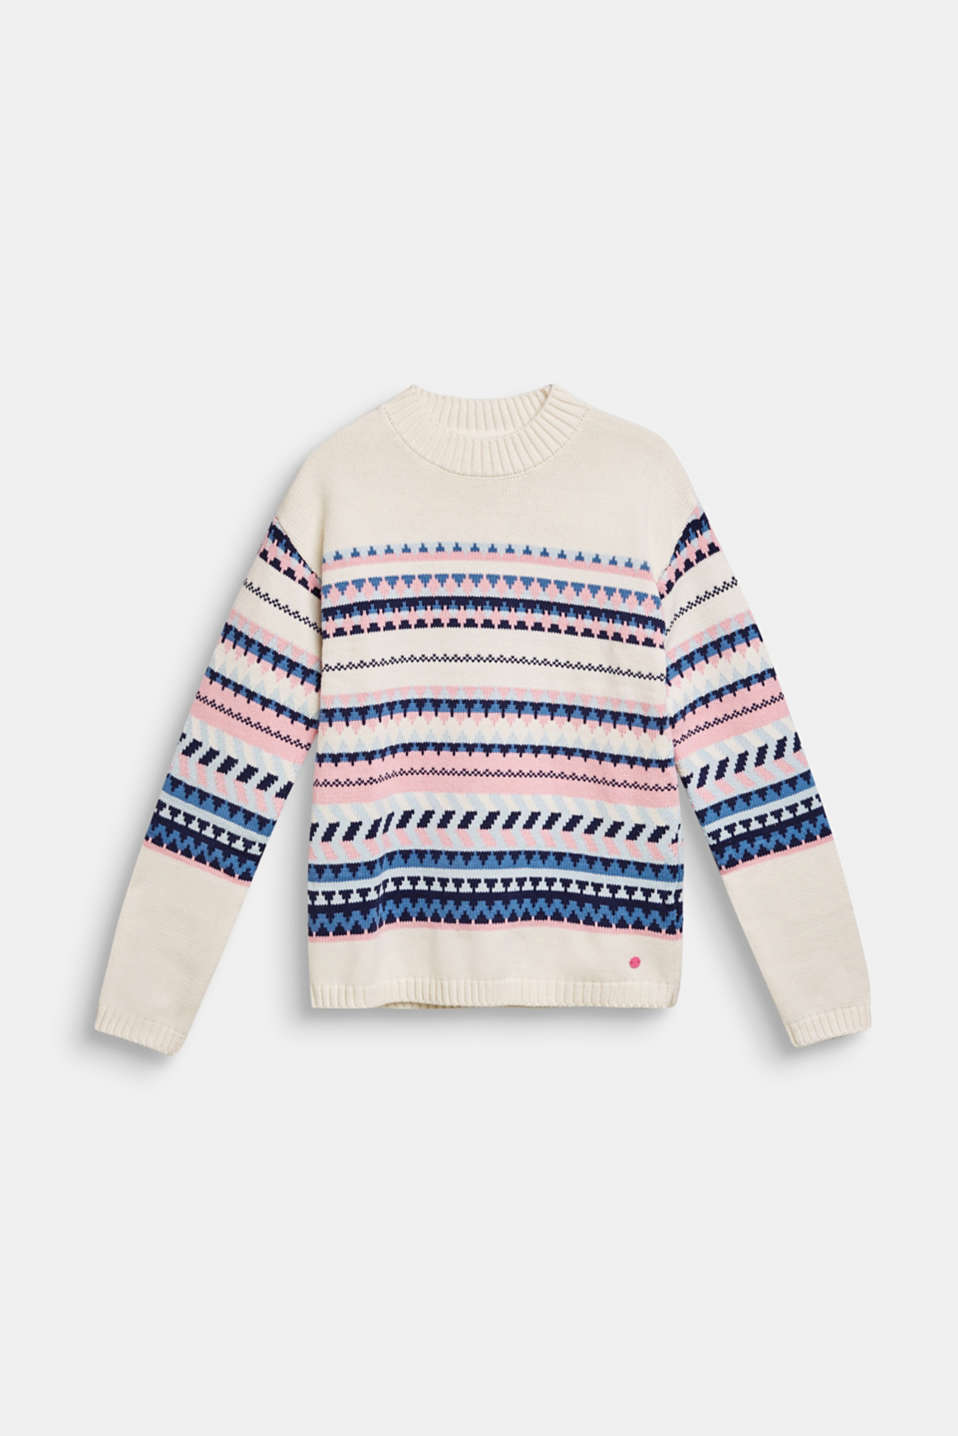 Blended cotton jacquard jumper, LCOFF WHITE, detail image number 0